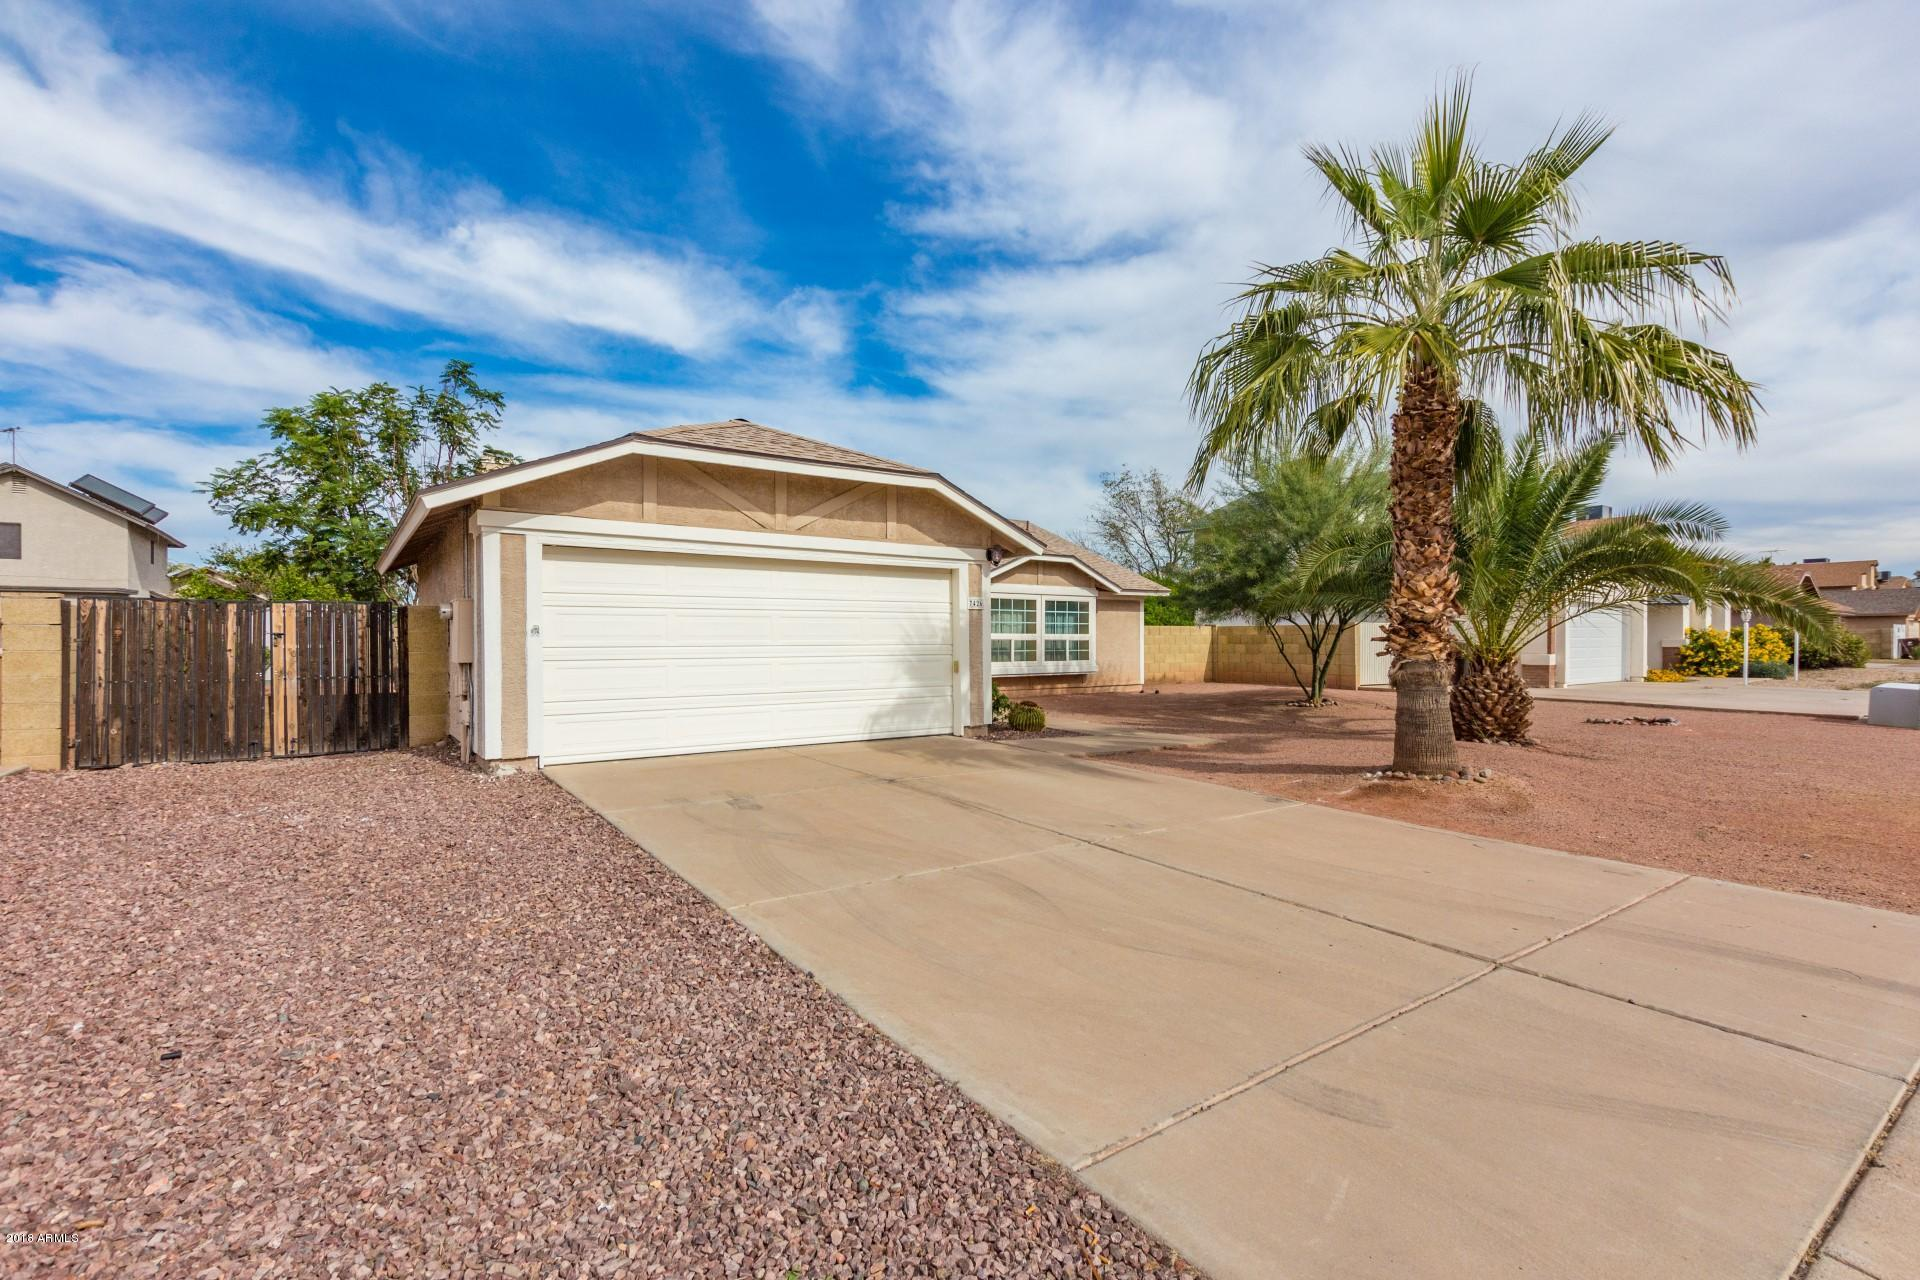 Photo of 7426 W CHOLLA Street, Peoria, AZ 85345